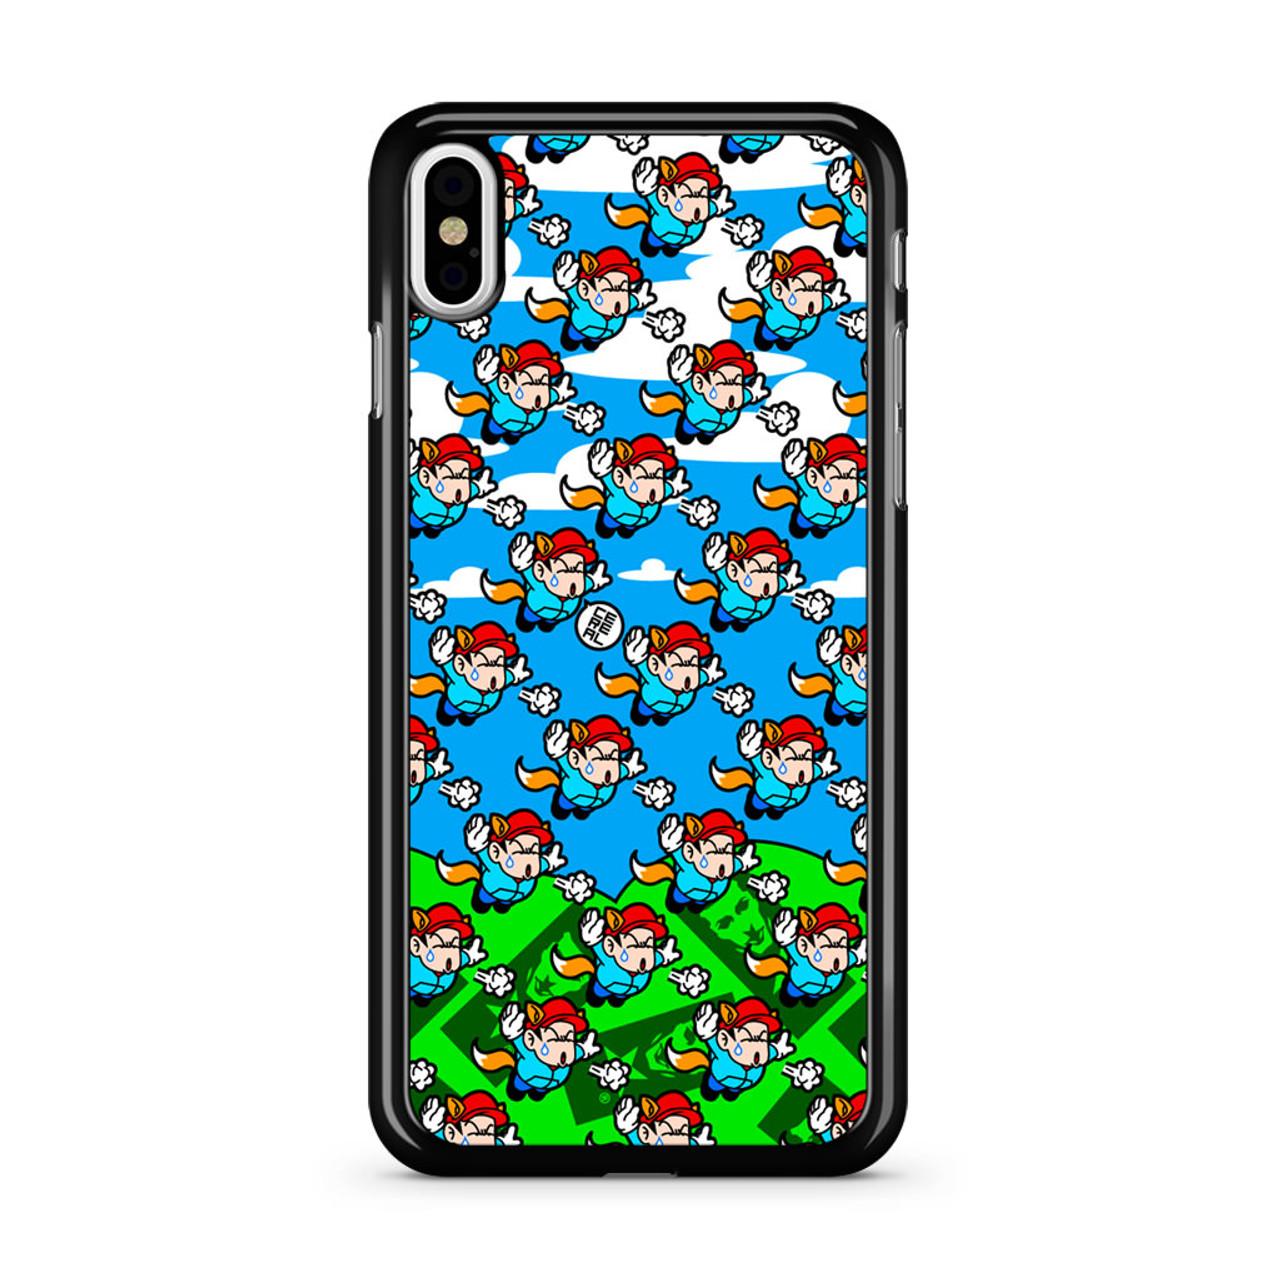 online store 70afa d2861 Billionaire Boys Club Mario iPhone X Case